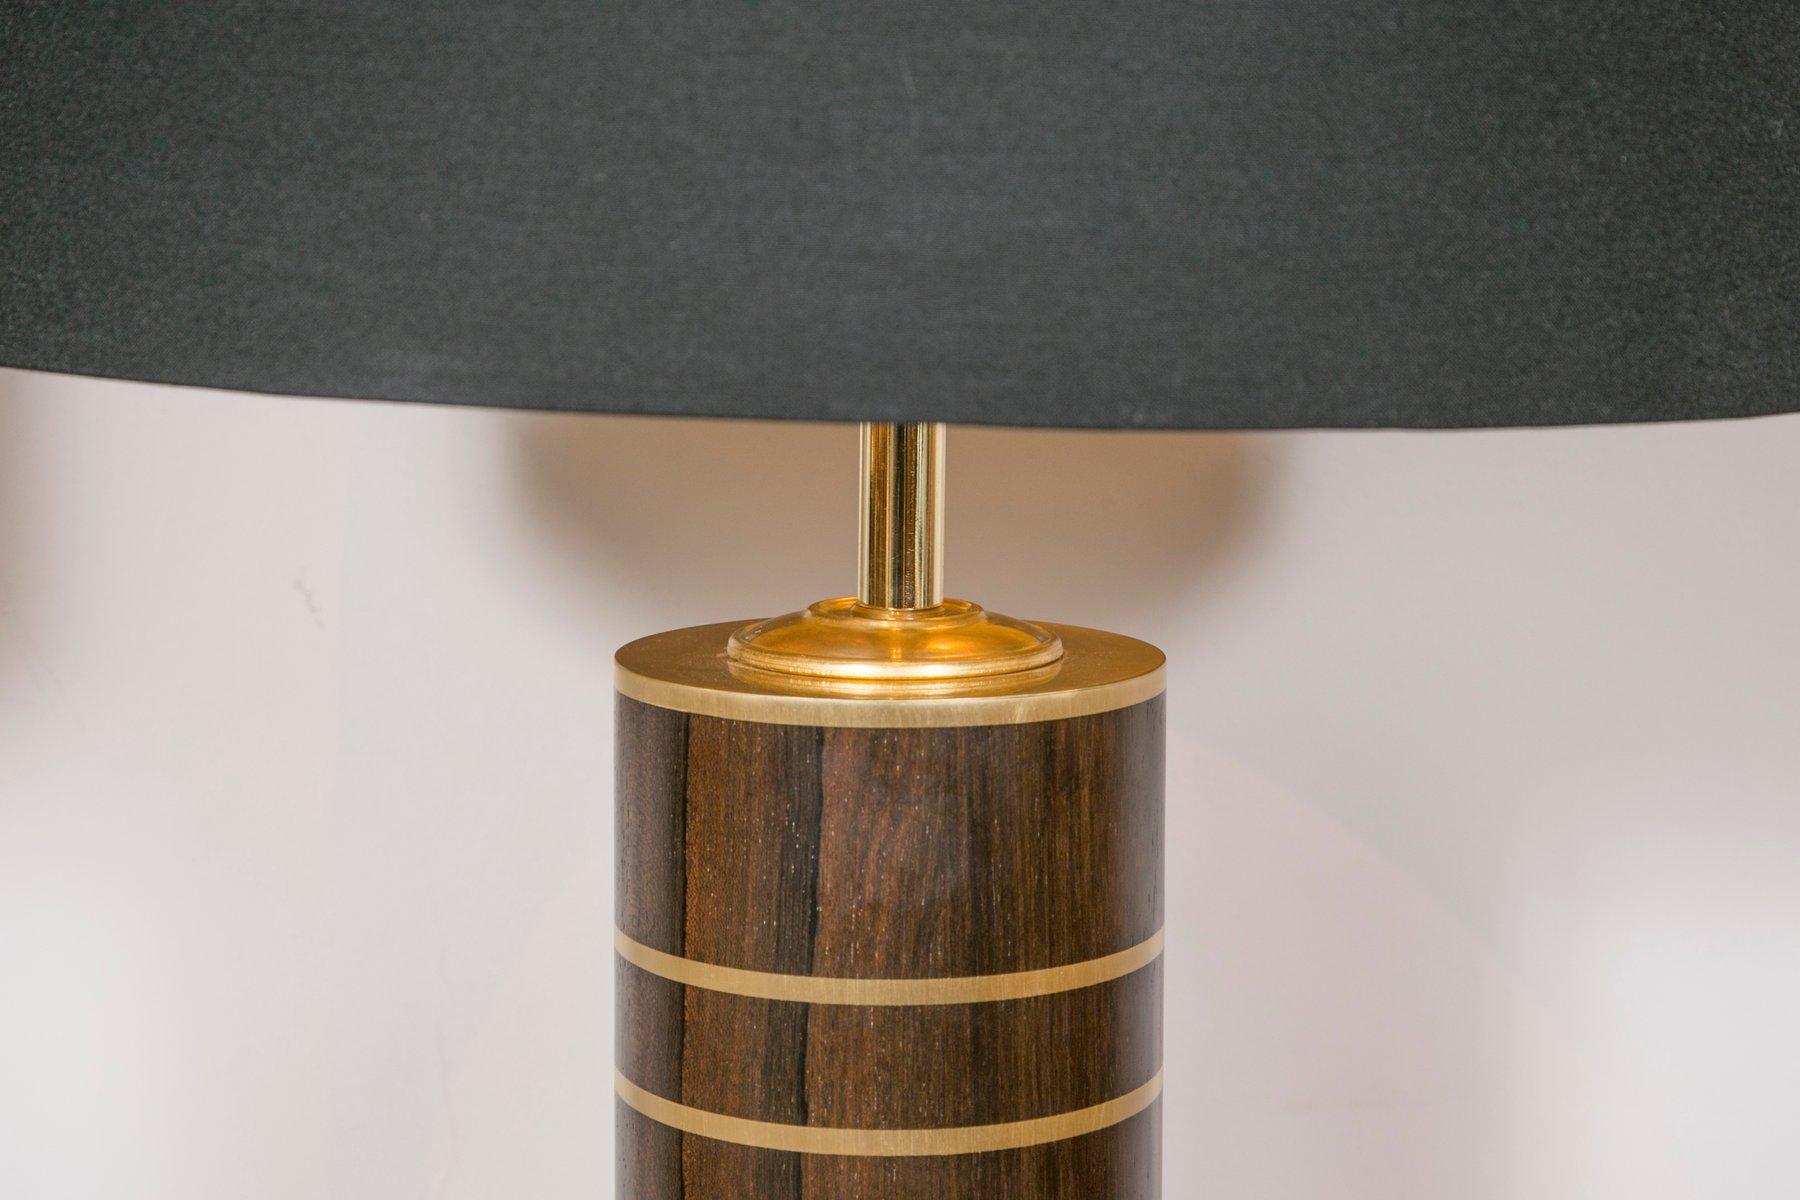 lampen aus mahagoni messing 1980er 2er set bei pamono. Black Bedroom Furniture Sets. Home Design Ideas